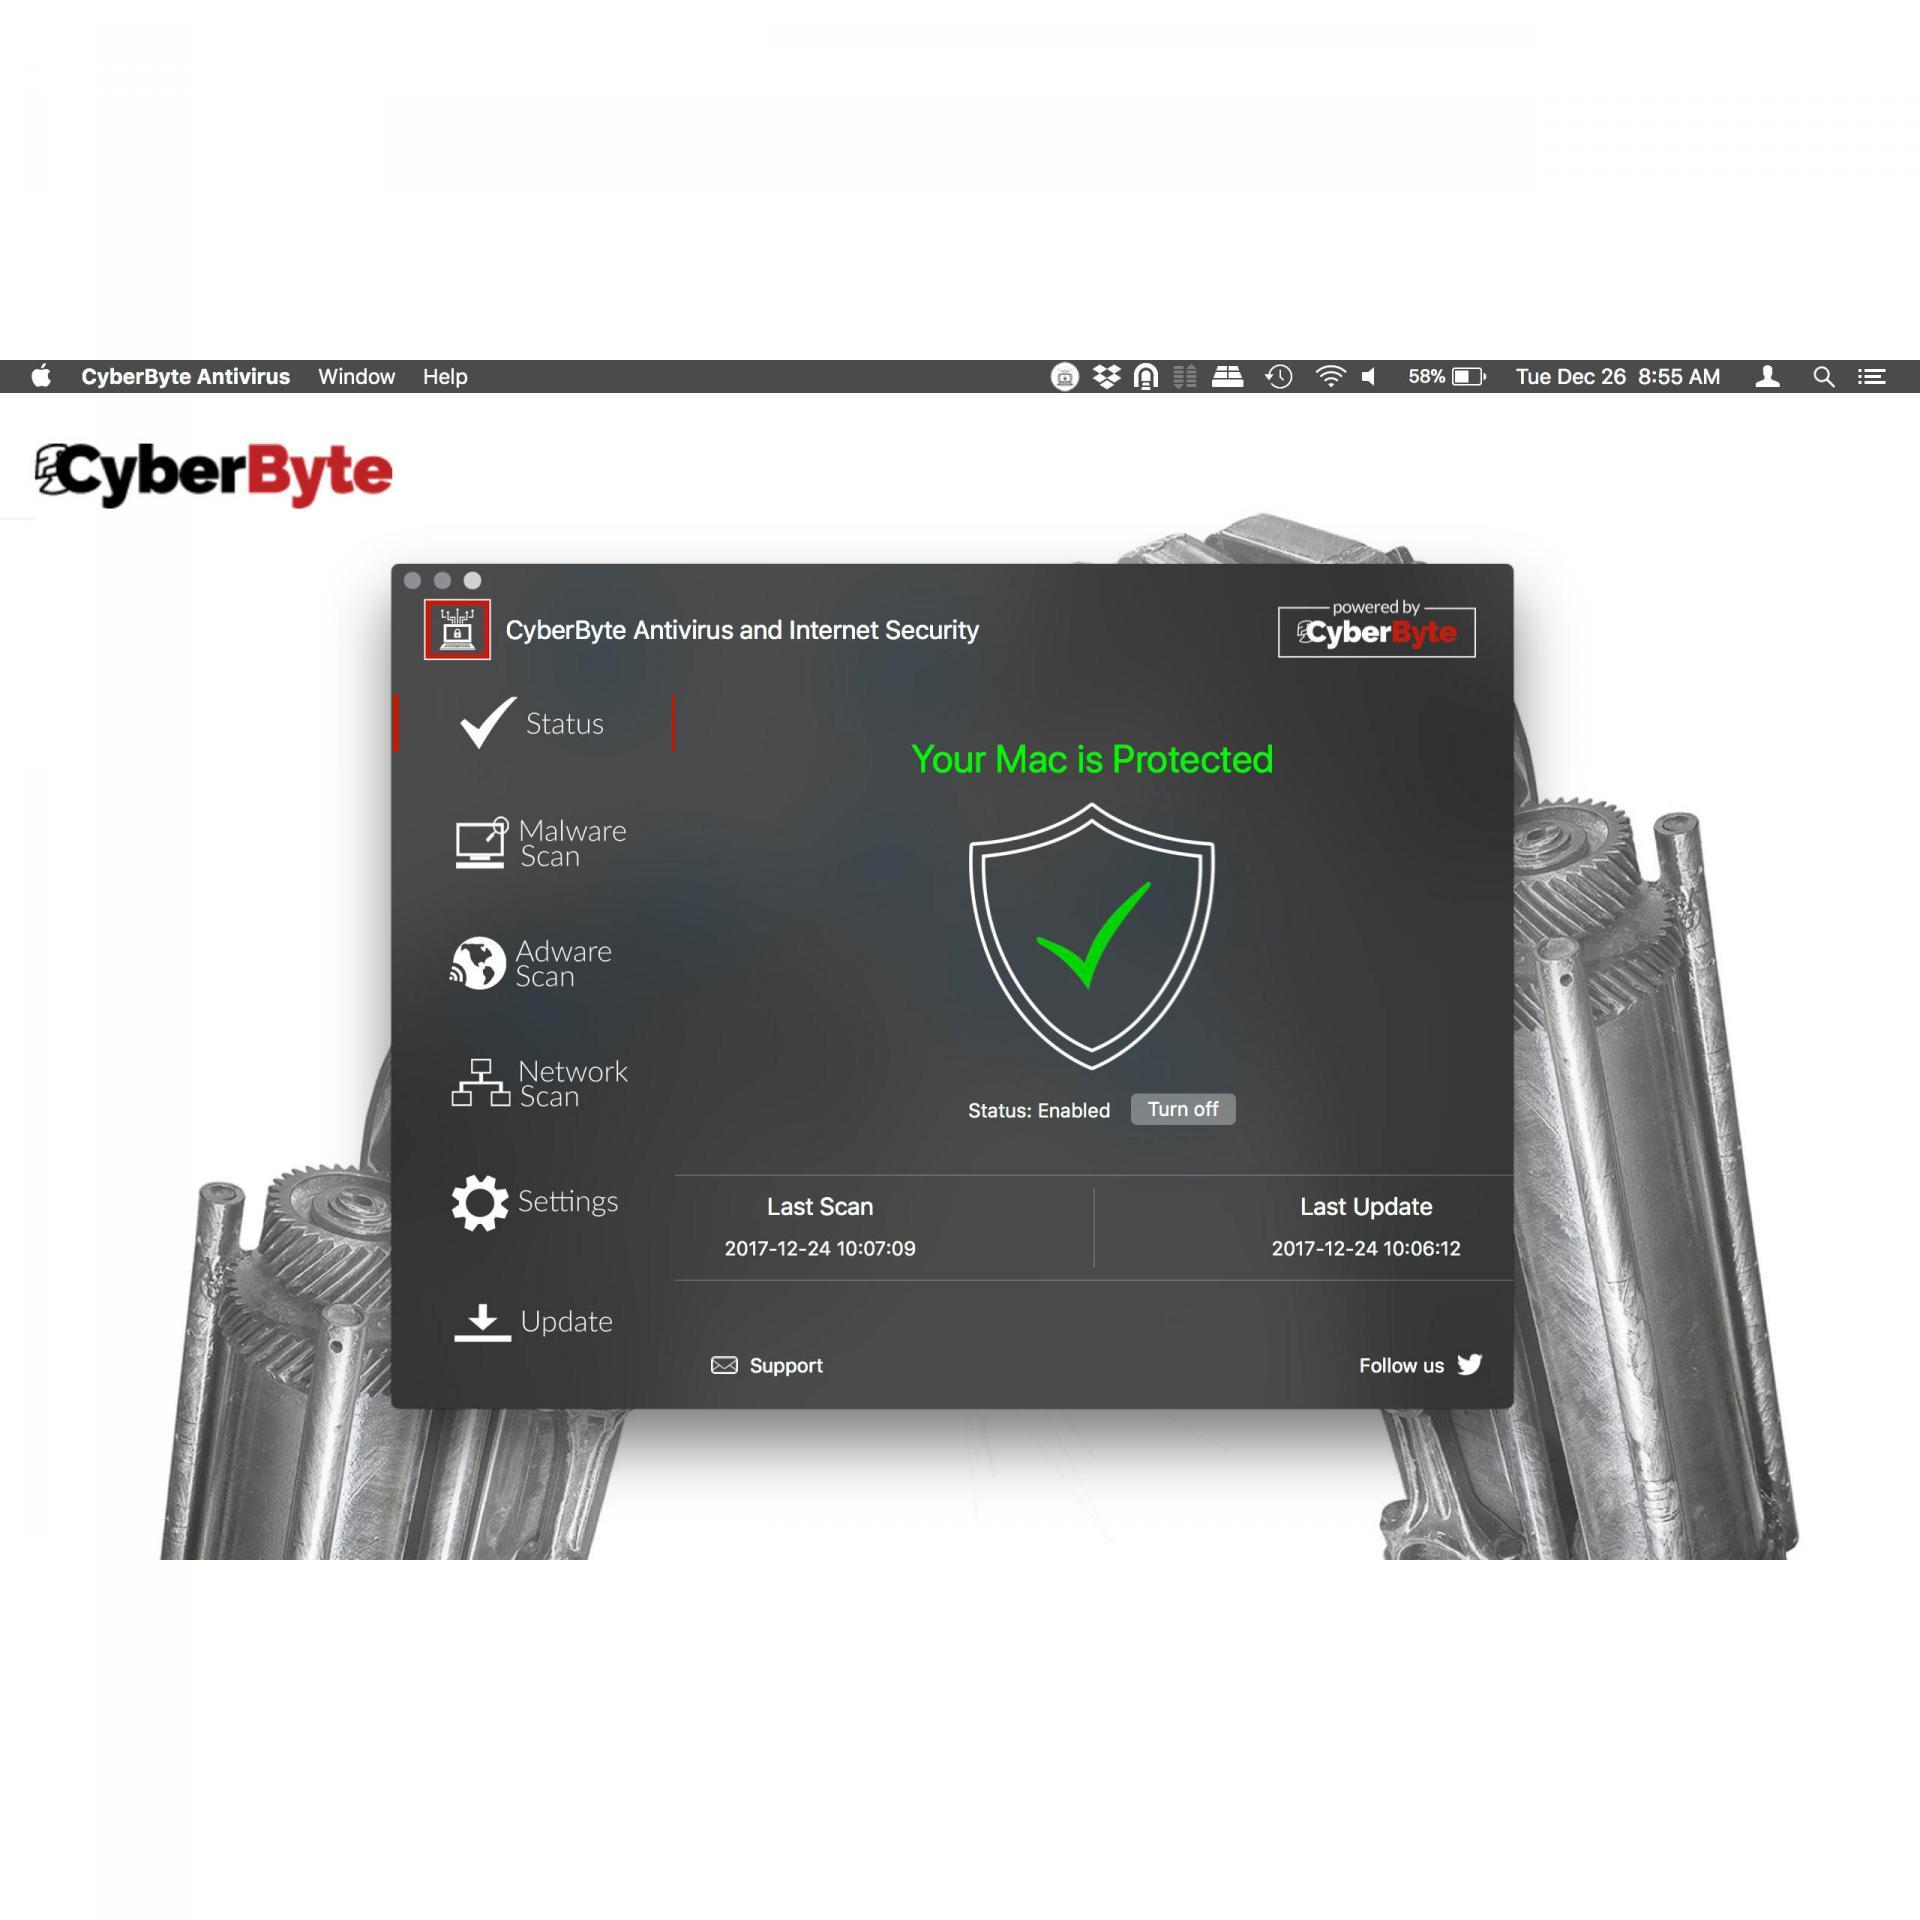 cyberbyte-antivirus_2_329780.jpg